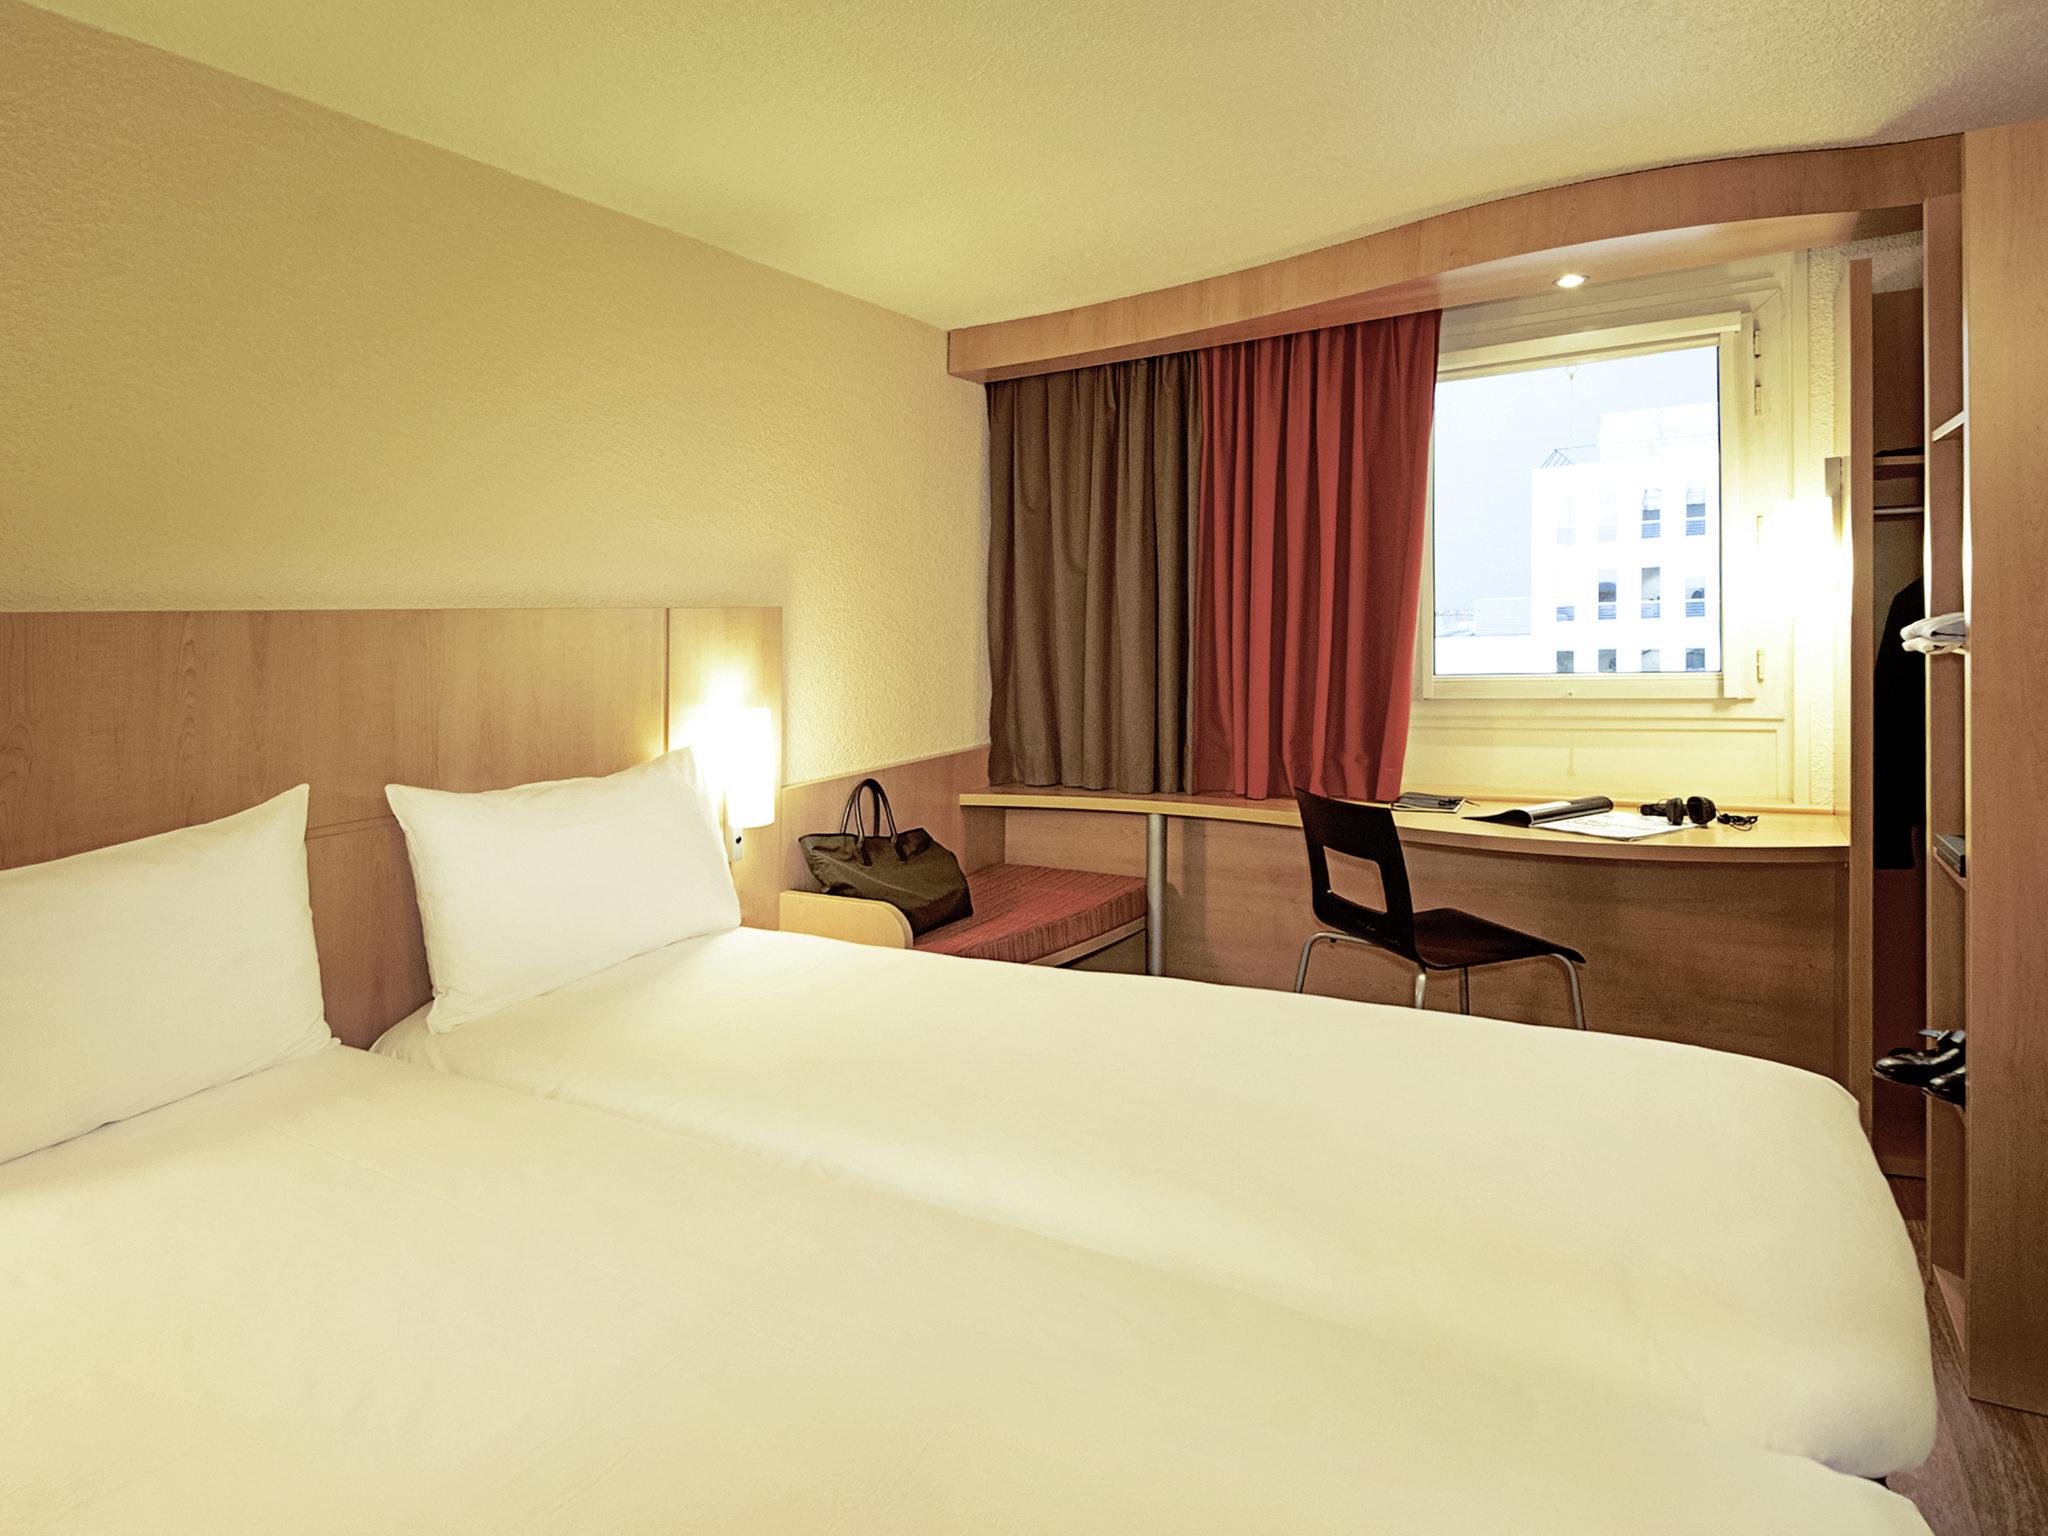 فندق - إيبيس ibis دوسلدورف هوبتبانهوف